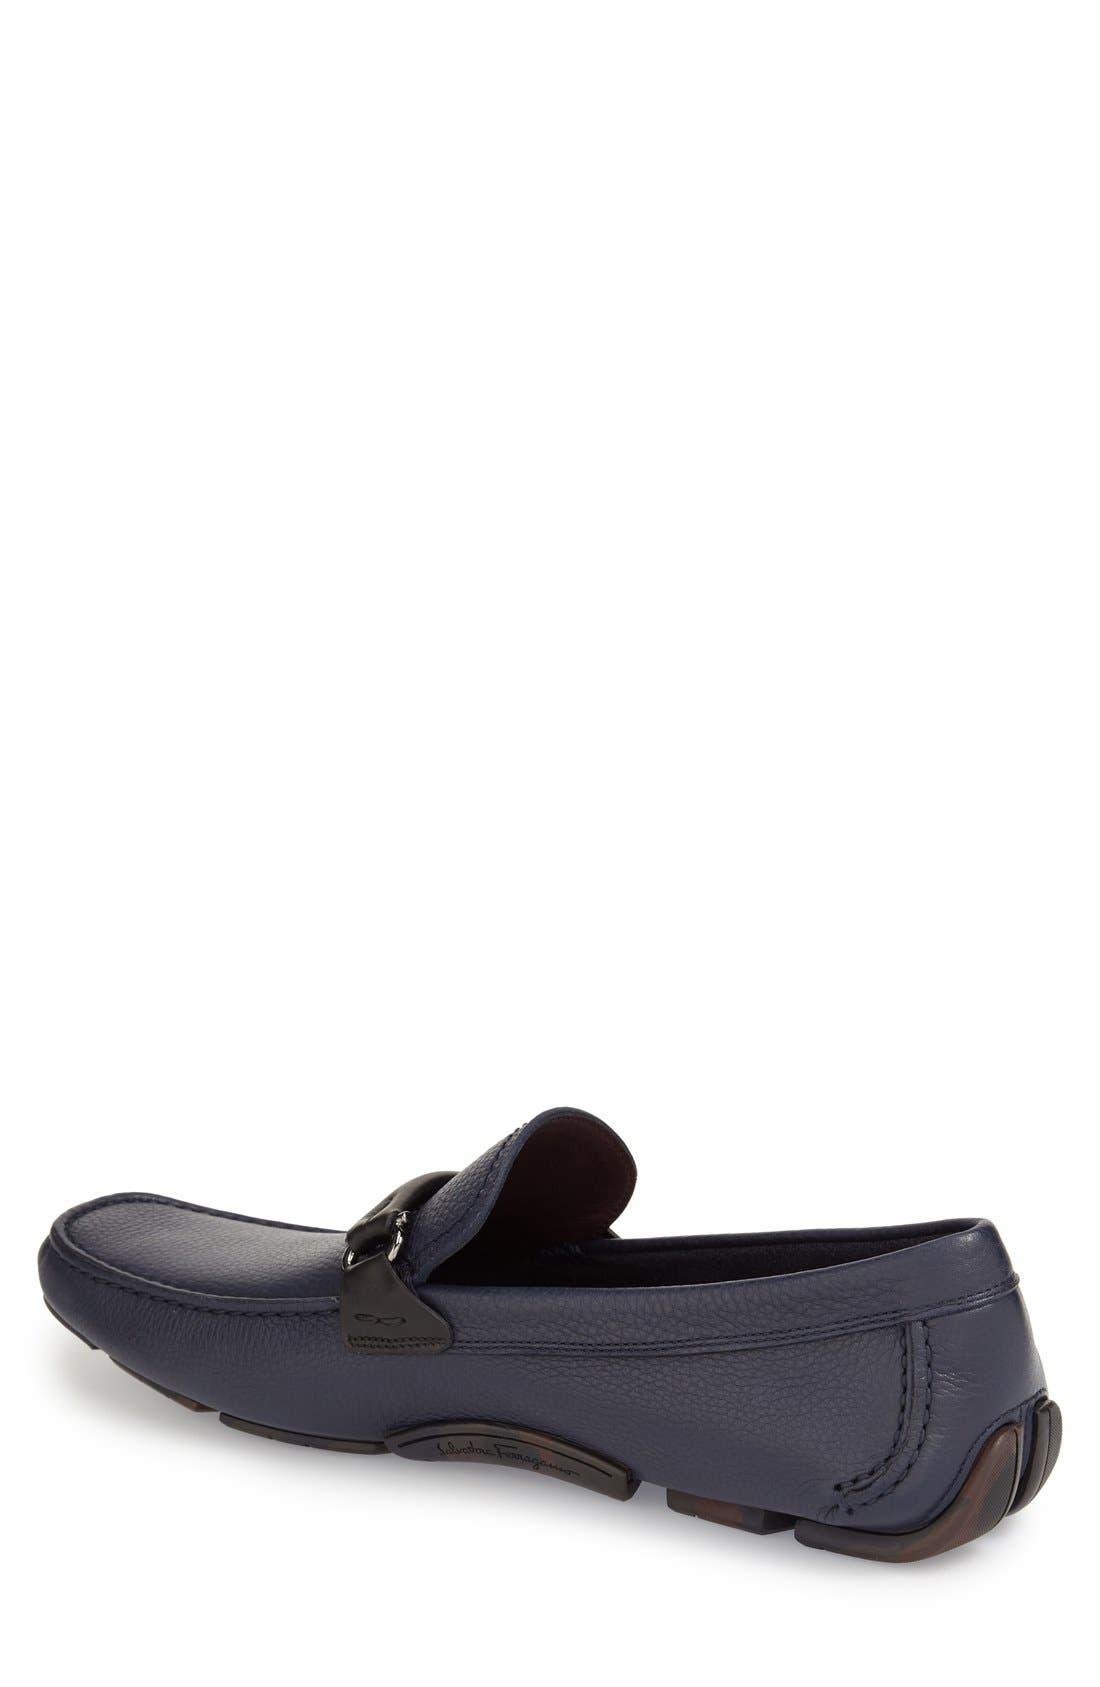 SALVATORE FERRAGAMO, GranprixDriving Shoe, Alternate thumbnail 4, color, BLUE MARIN LEATHER